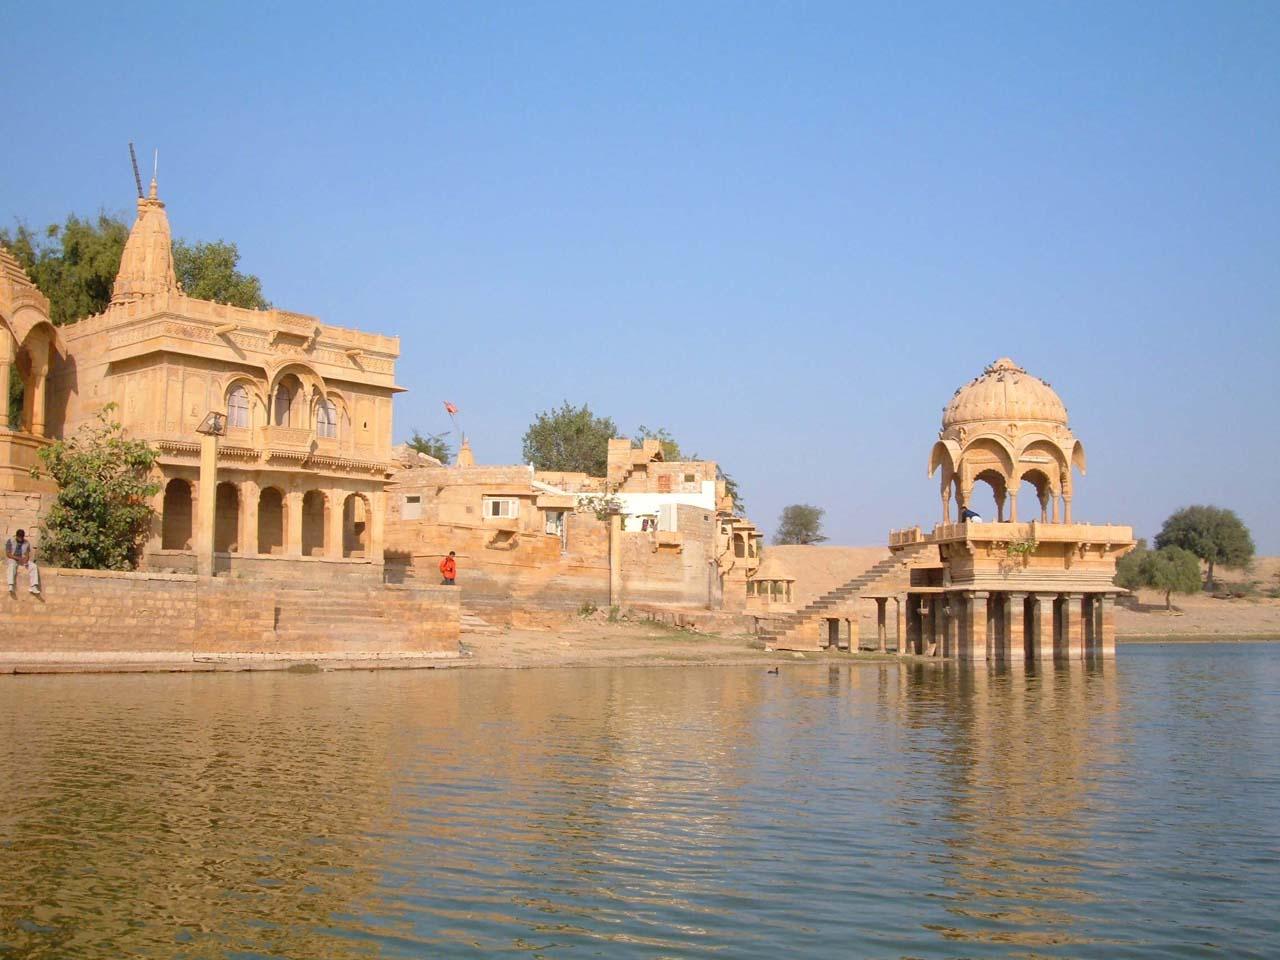 Ghats Gadisar Lake - Jaisalmer's places to visit